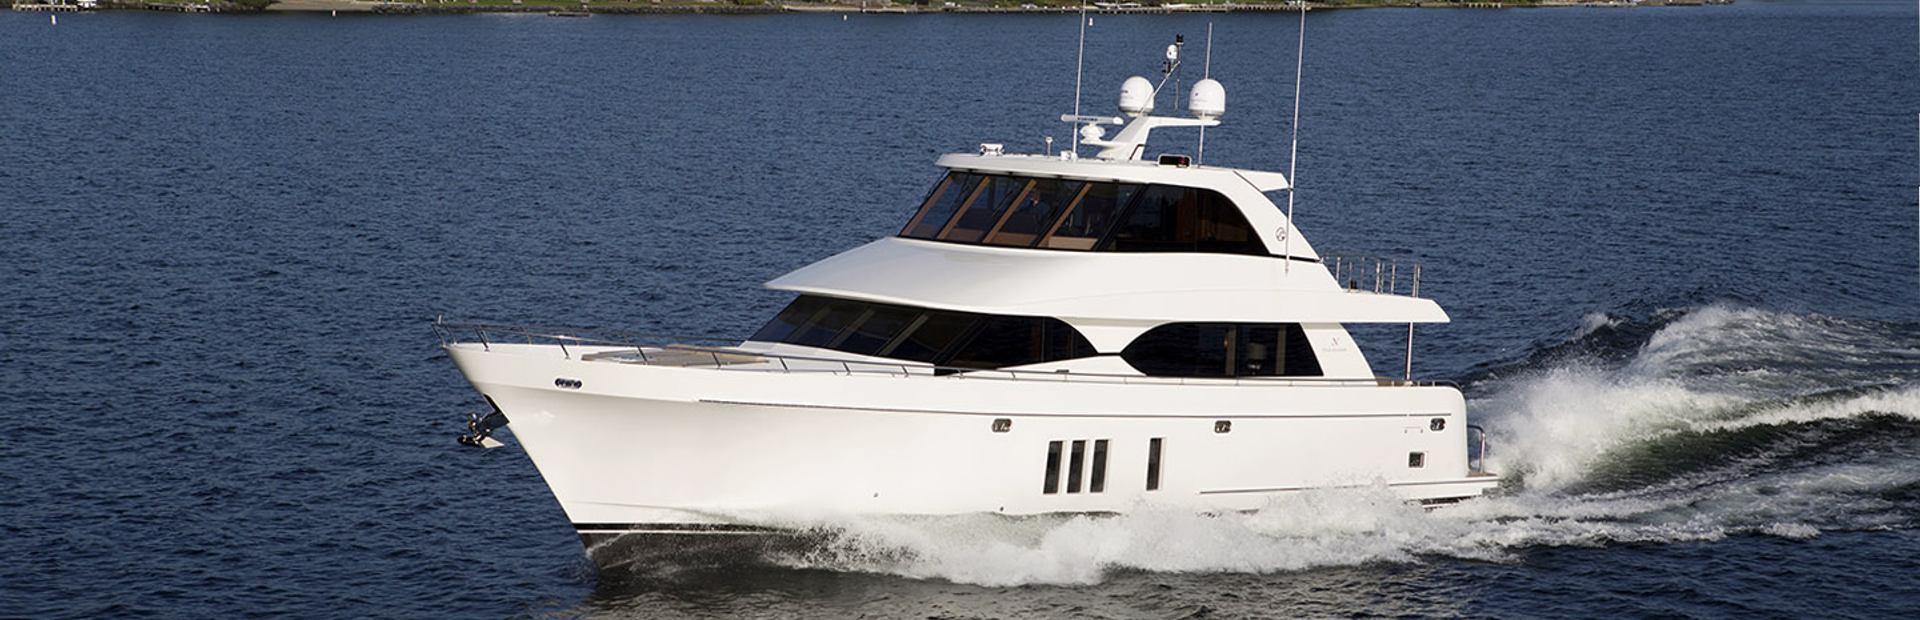 78 Motoryacht Yacht Charter